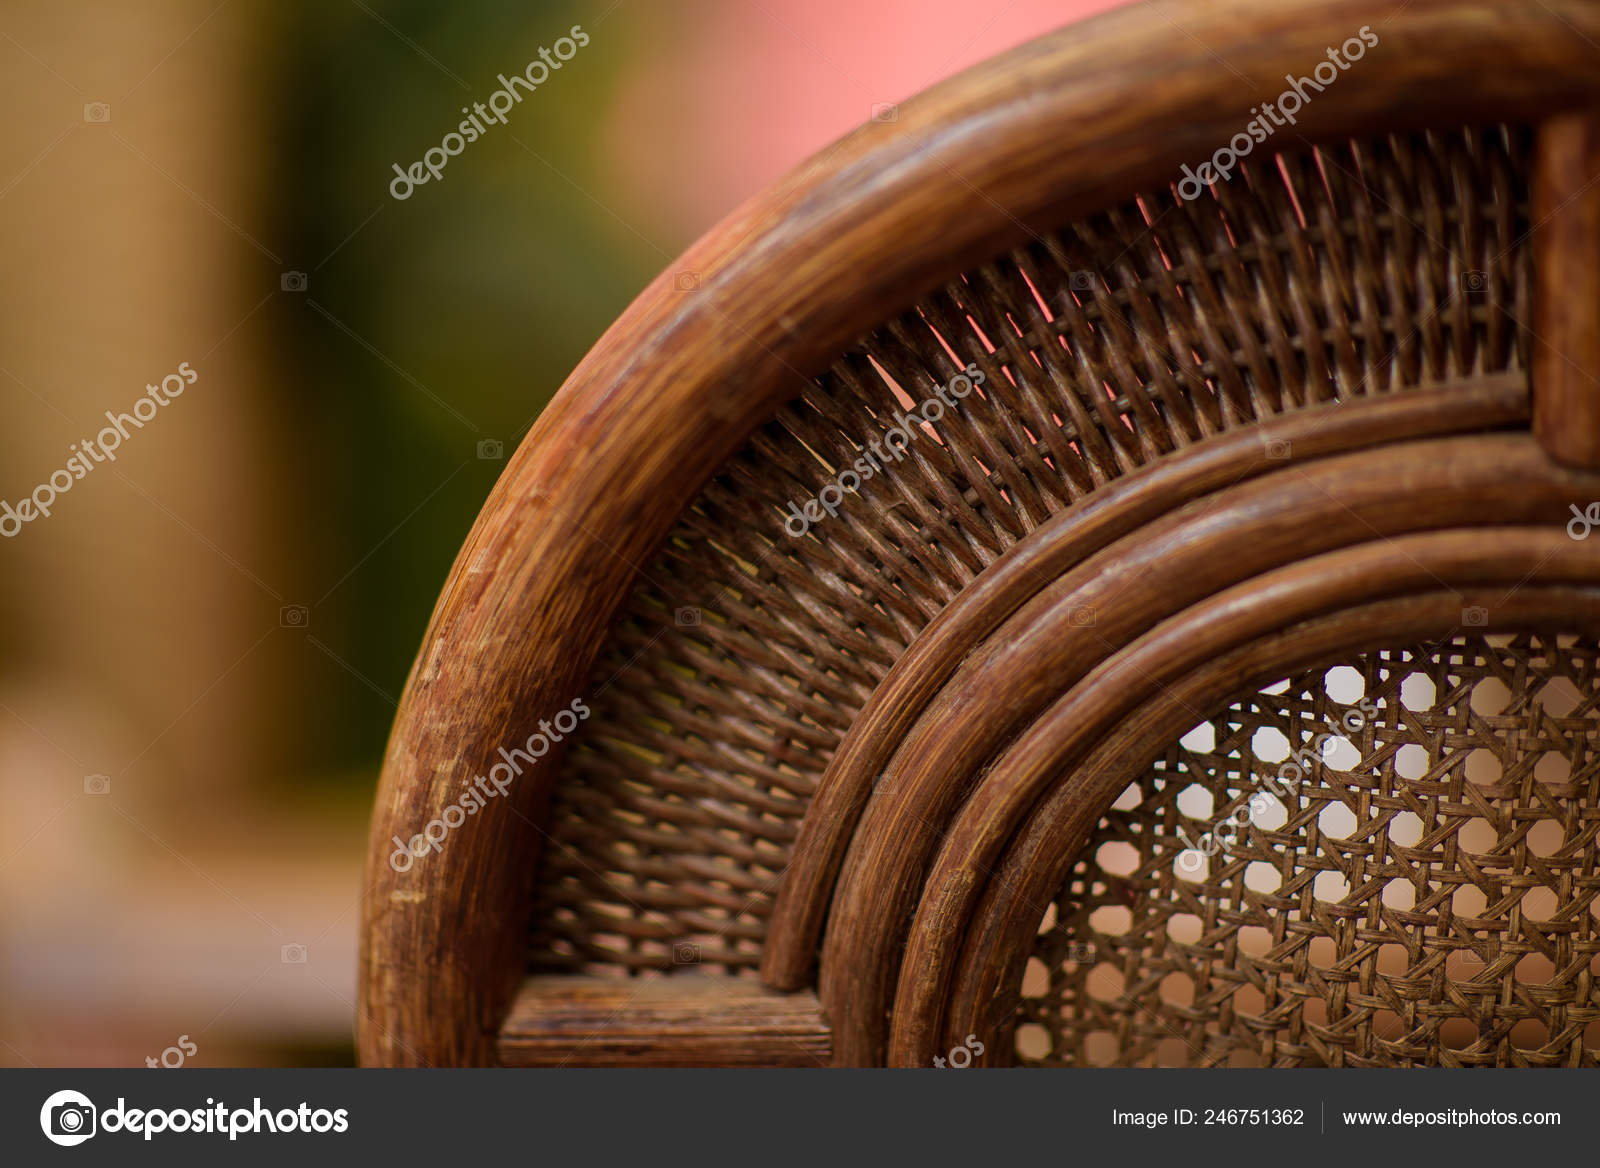 Muebles Mimbre Terraza Verano Del Restaurante Decor Textura